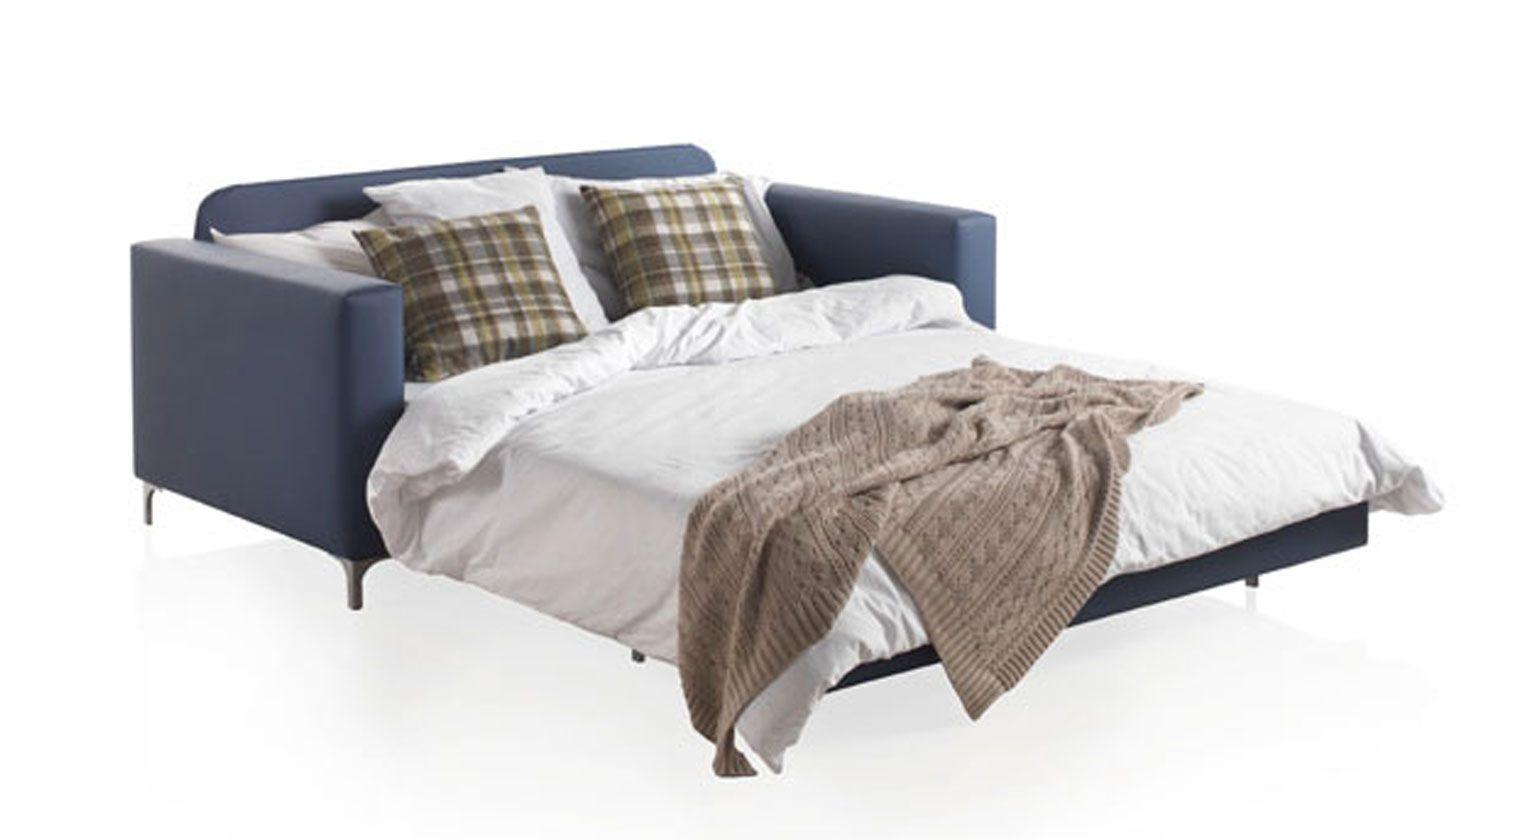 Sof cama brest sofas cama extensible nido - Sillones una plaza ...